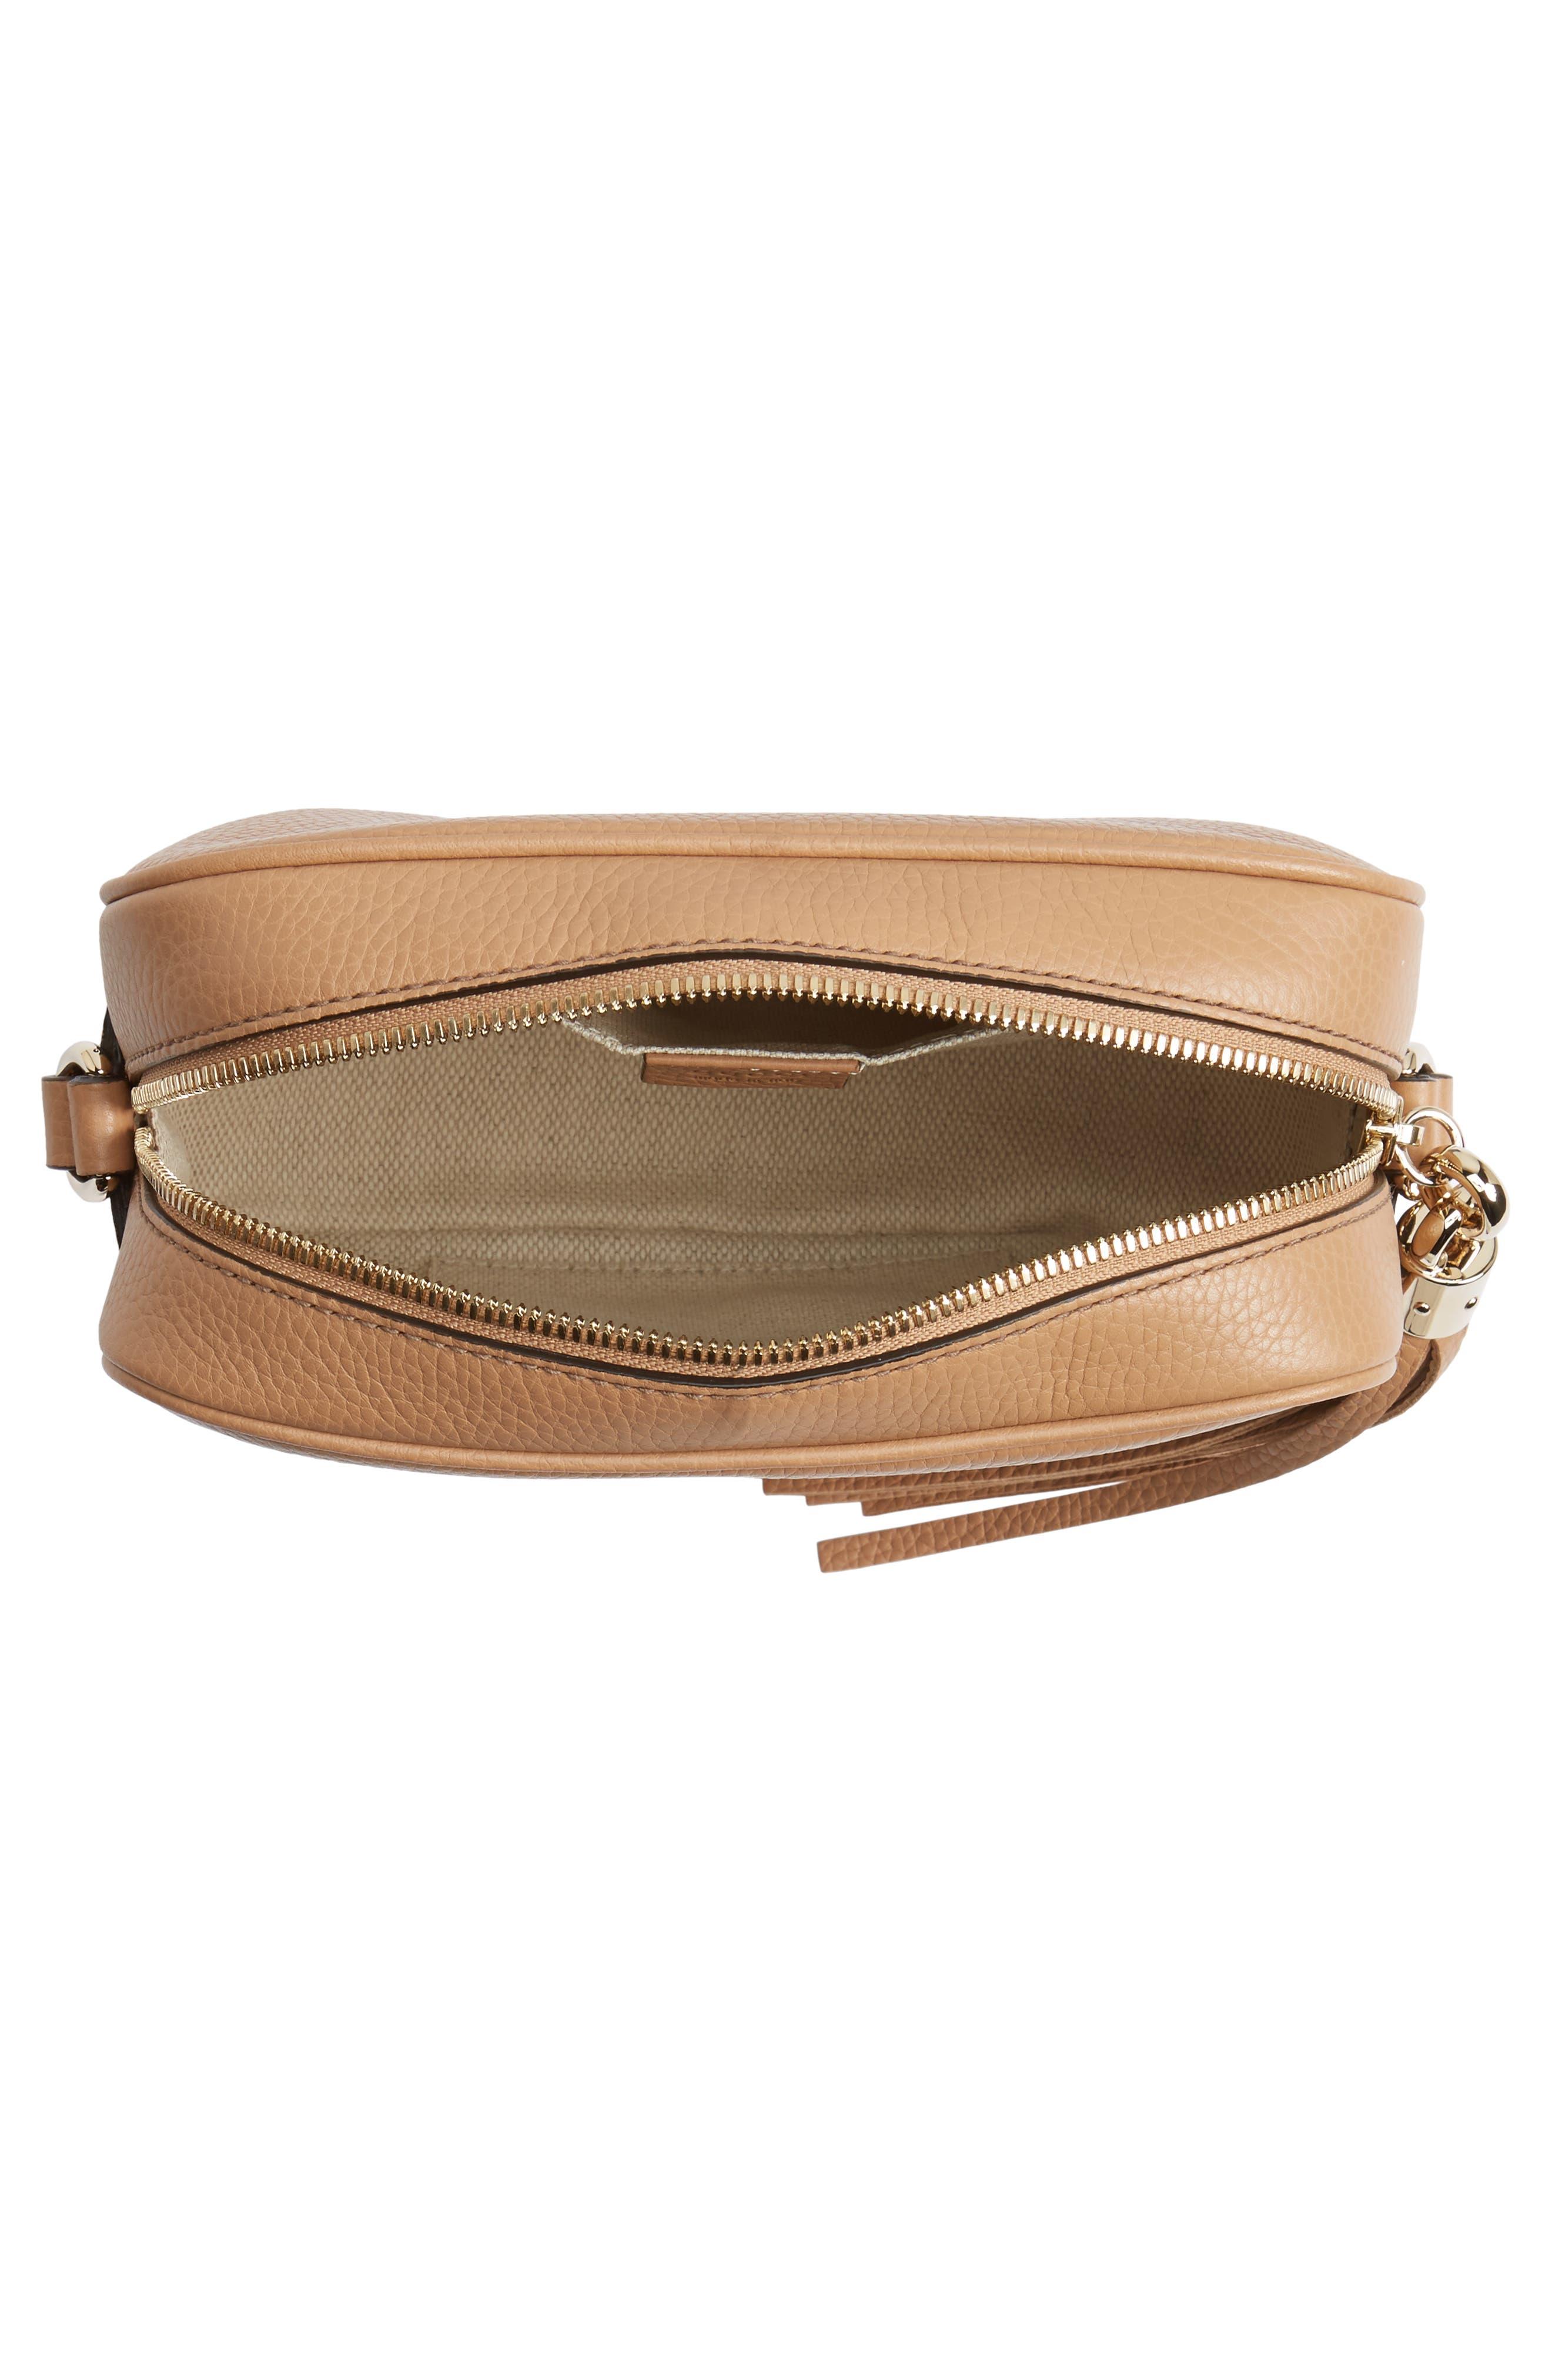 GUCCI, Soho Disco Leather Bag, Alternate thumbnail 4, color, 2754 CAMELIA